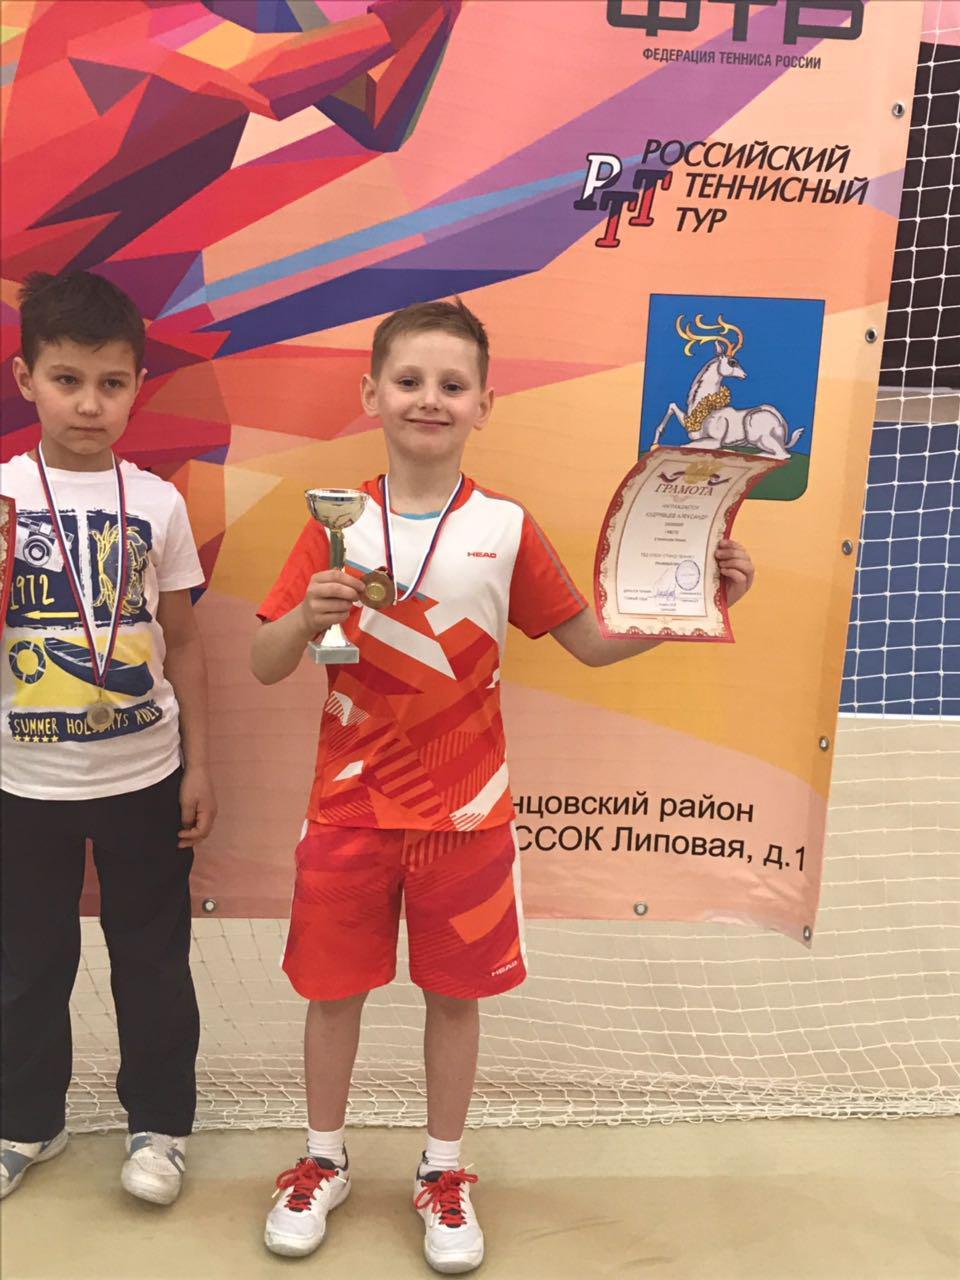 KudriavcevAlex_pobed_23042018